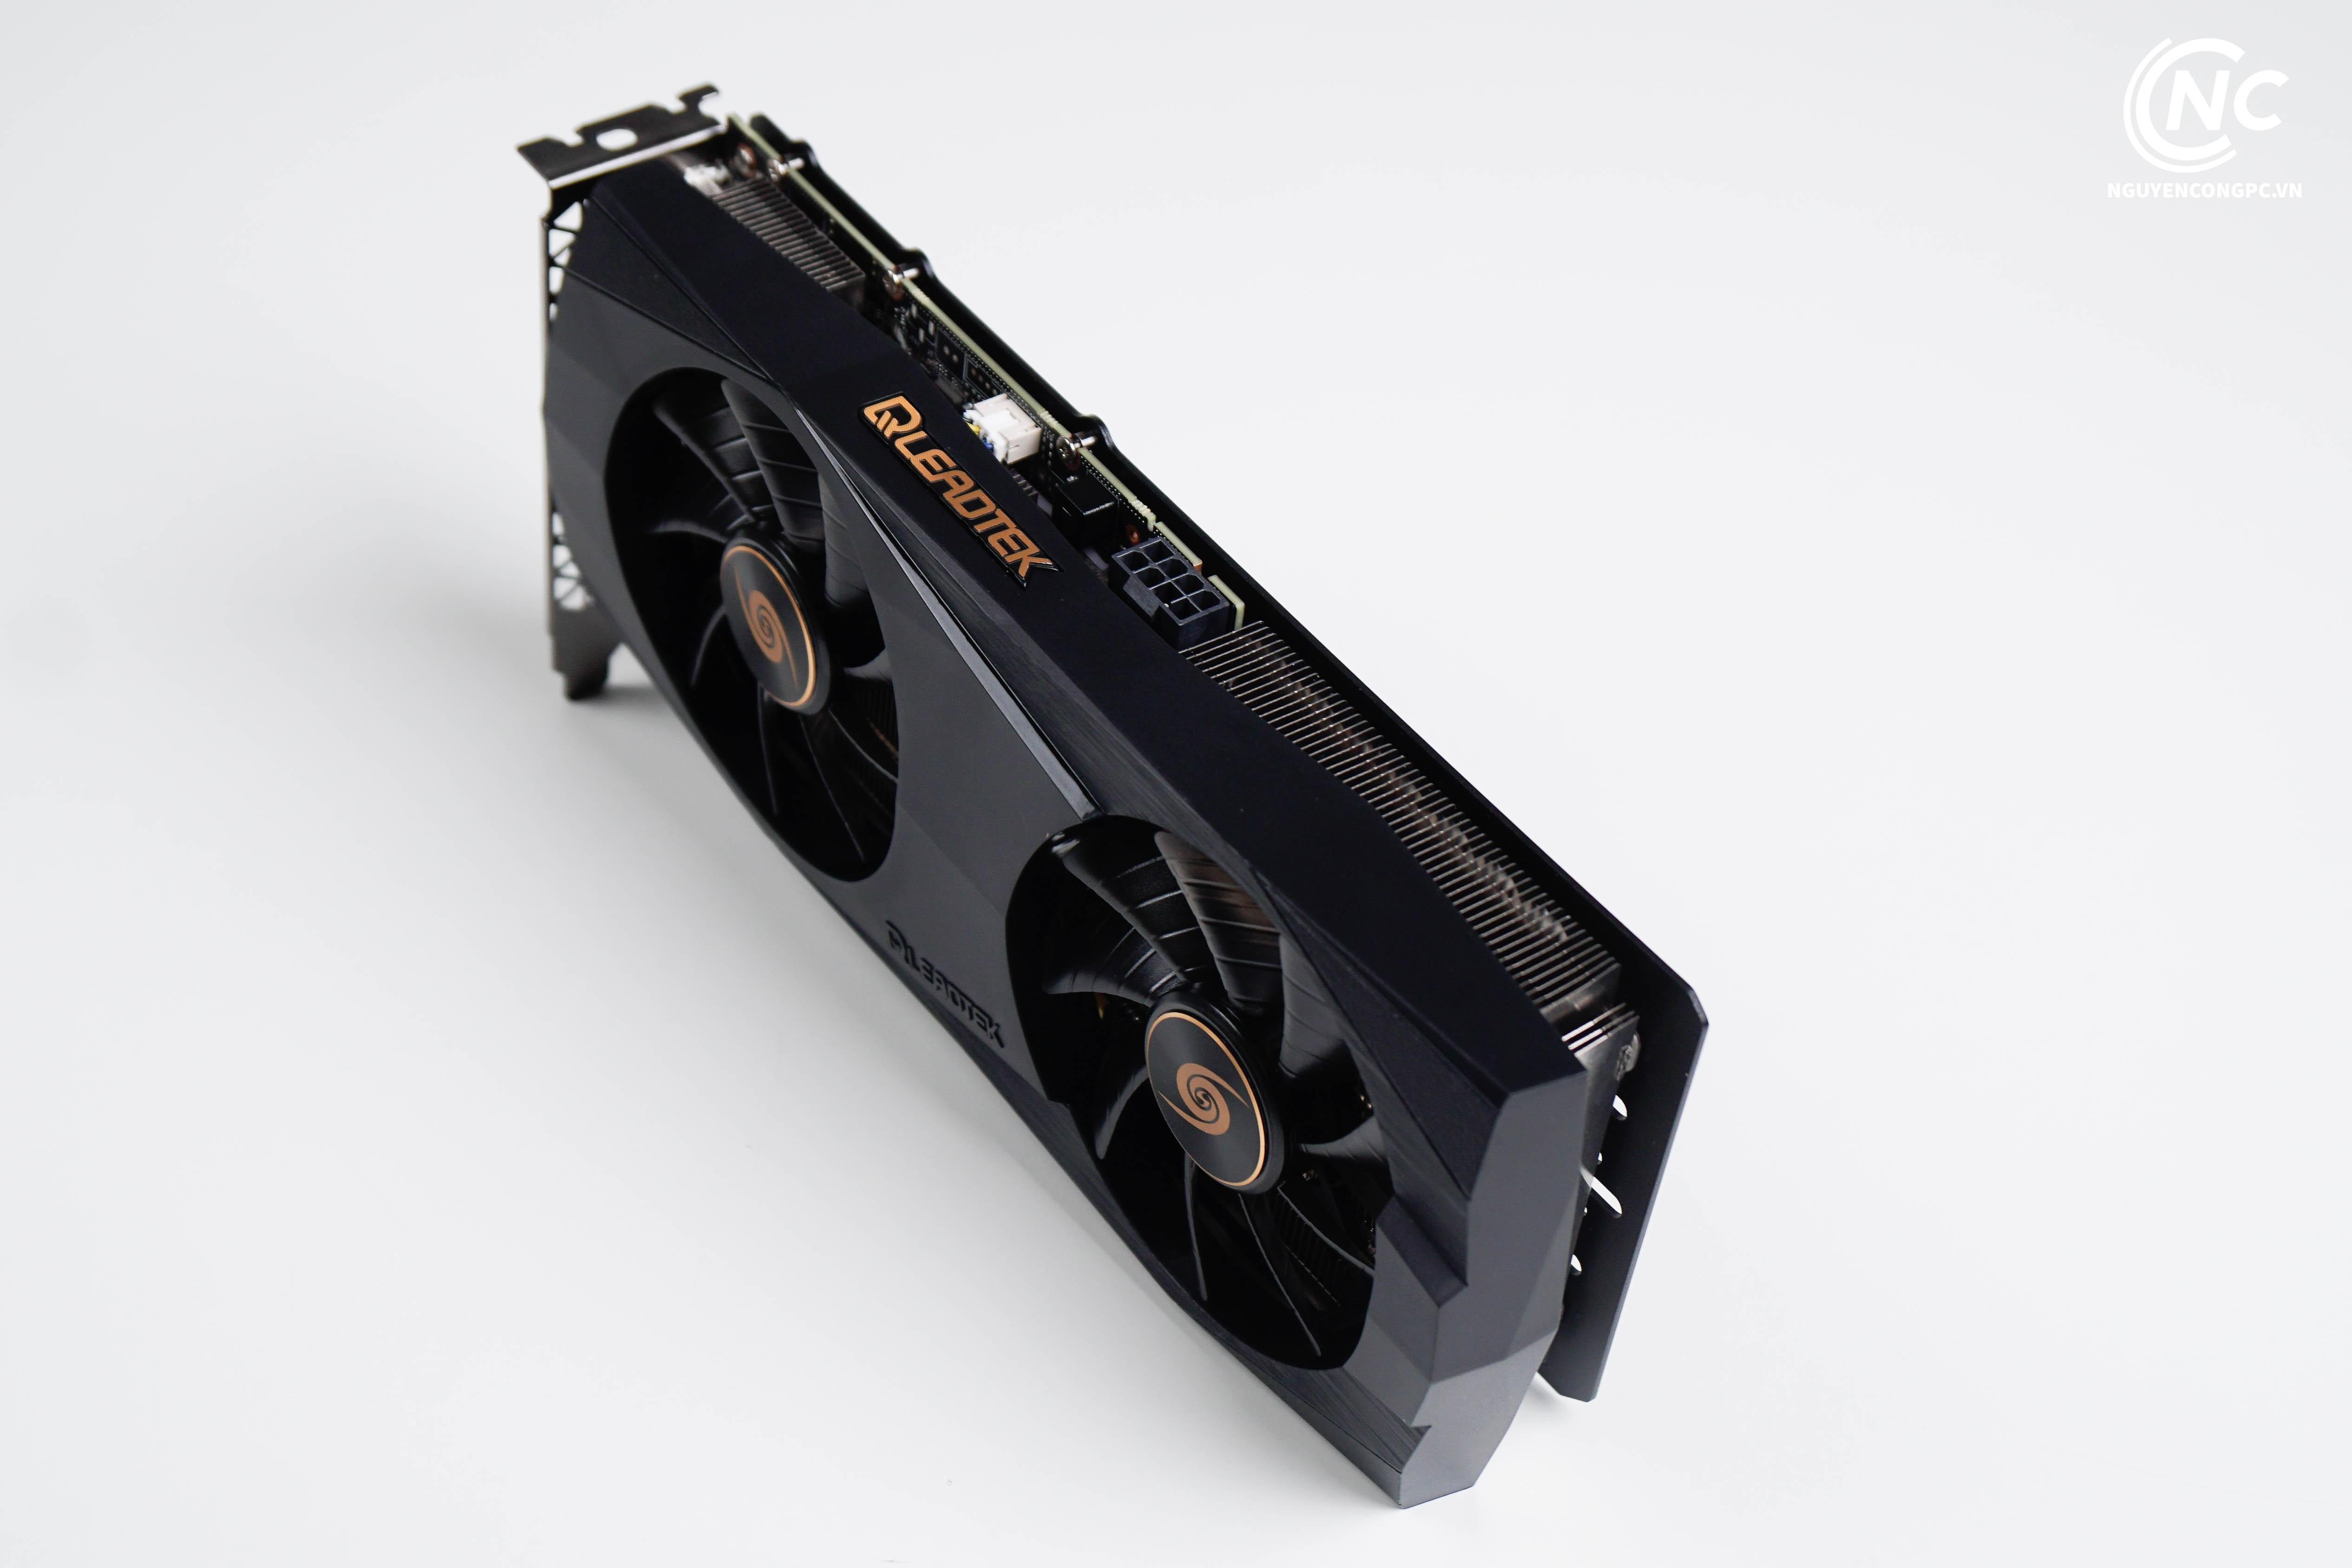 Leadtek WinFast RTX 3060 Ti HURRICANE power